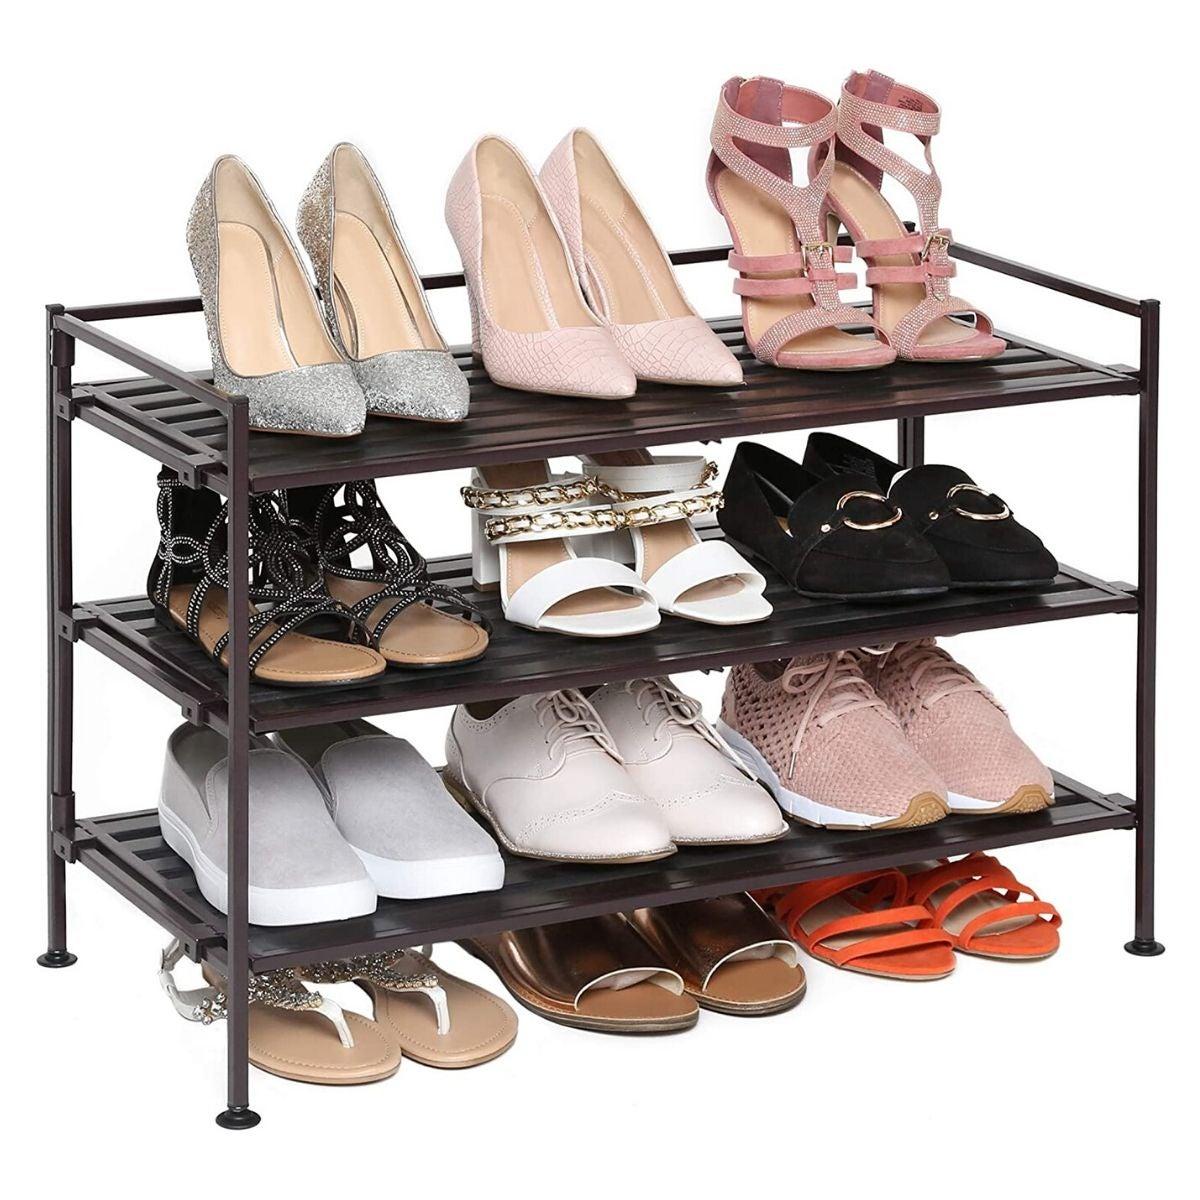 The Best Shoe Racks For Entryways And Closets Bob Vila